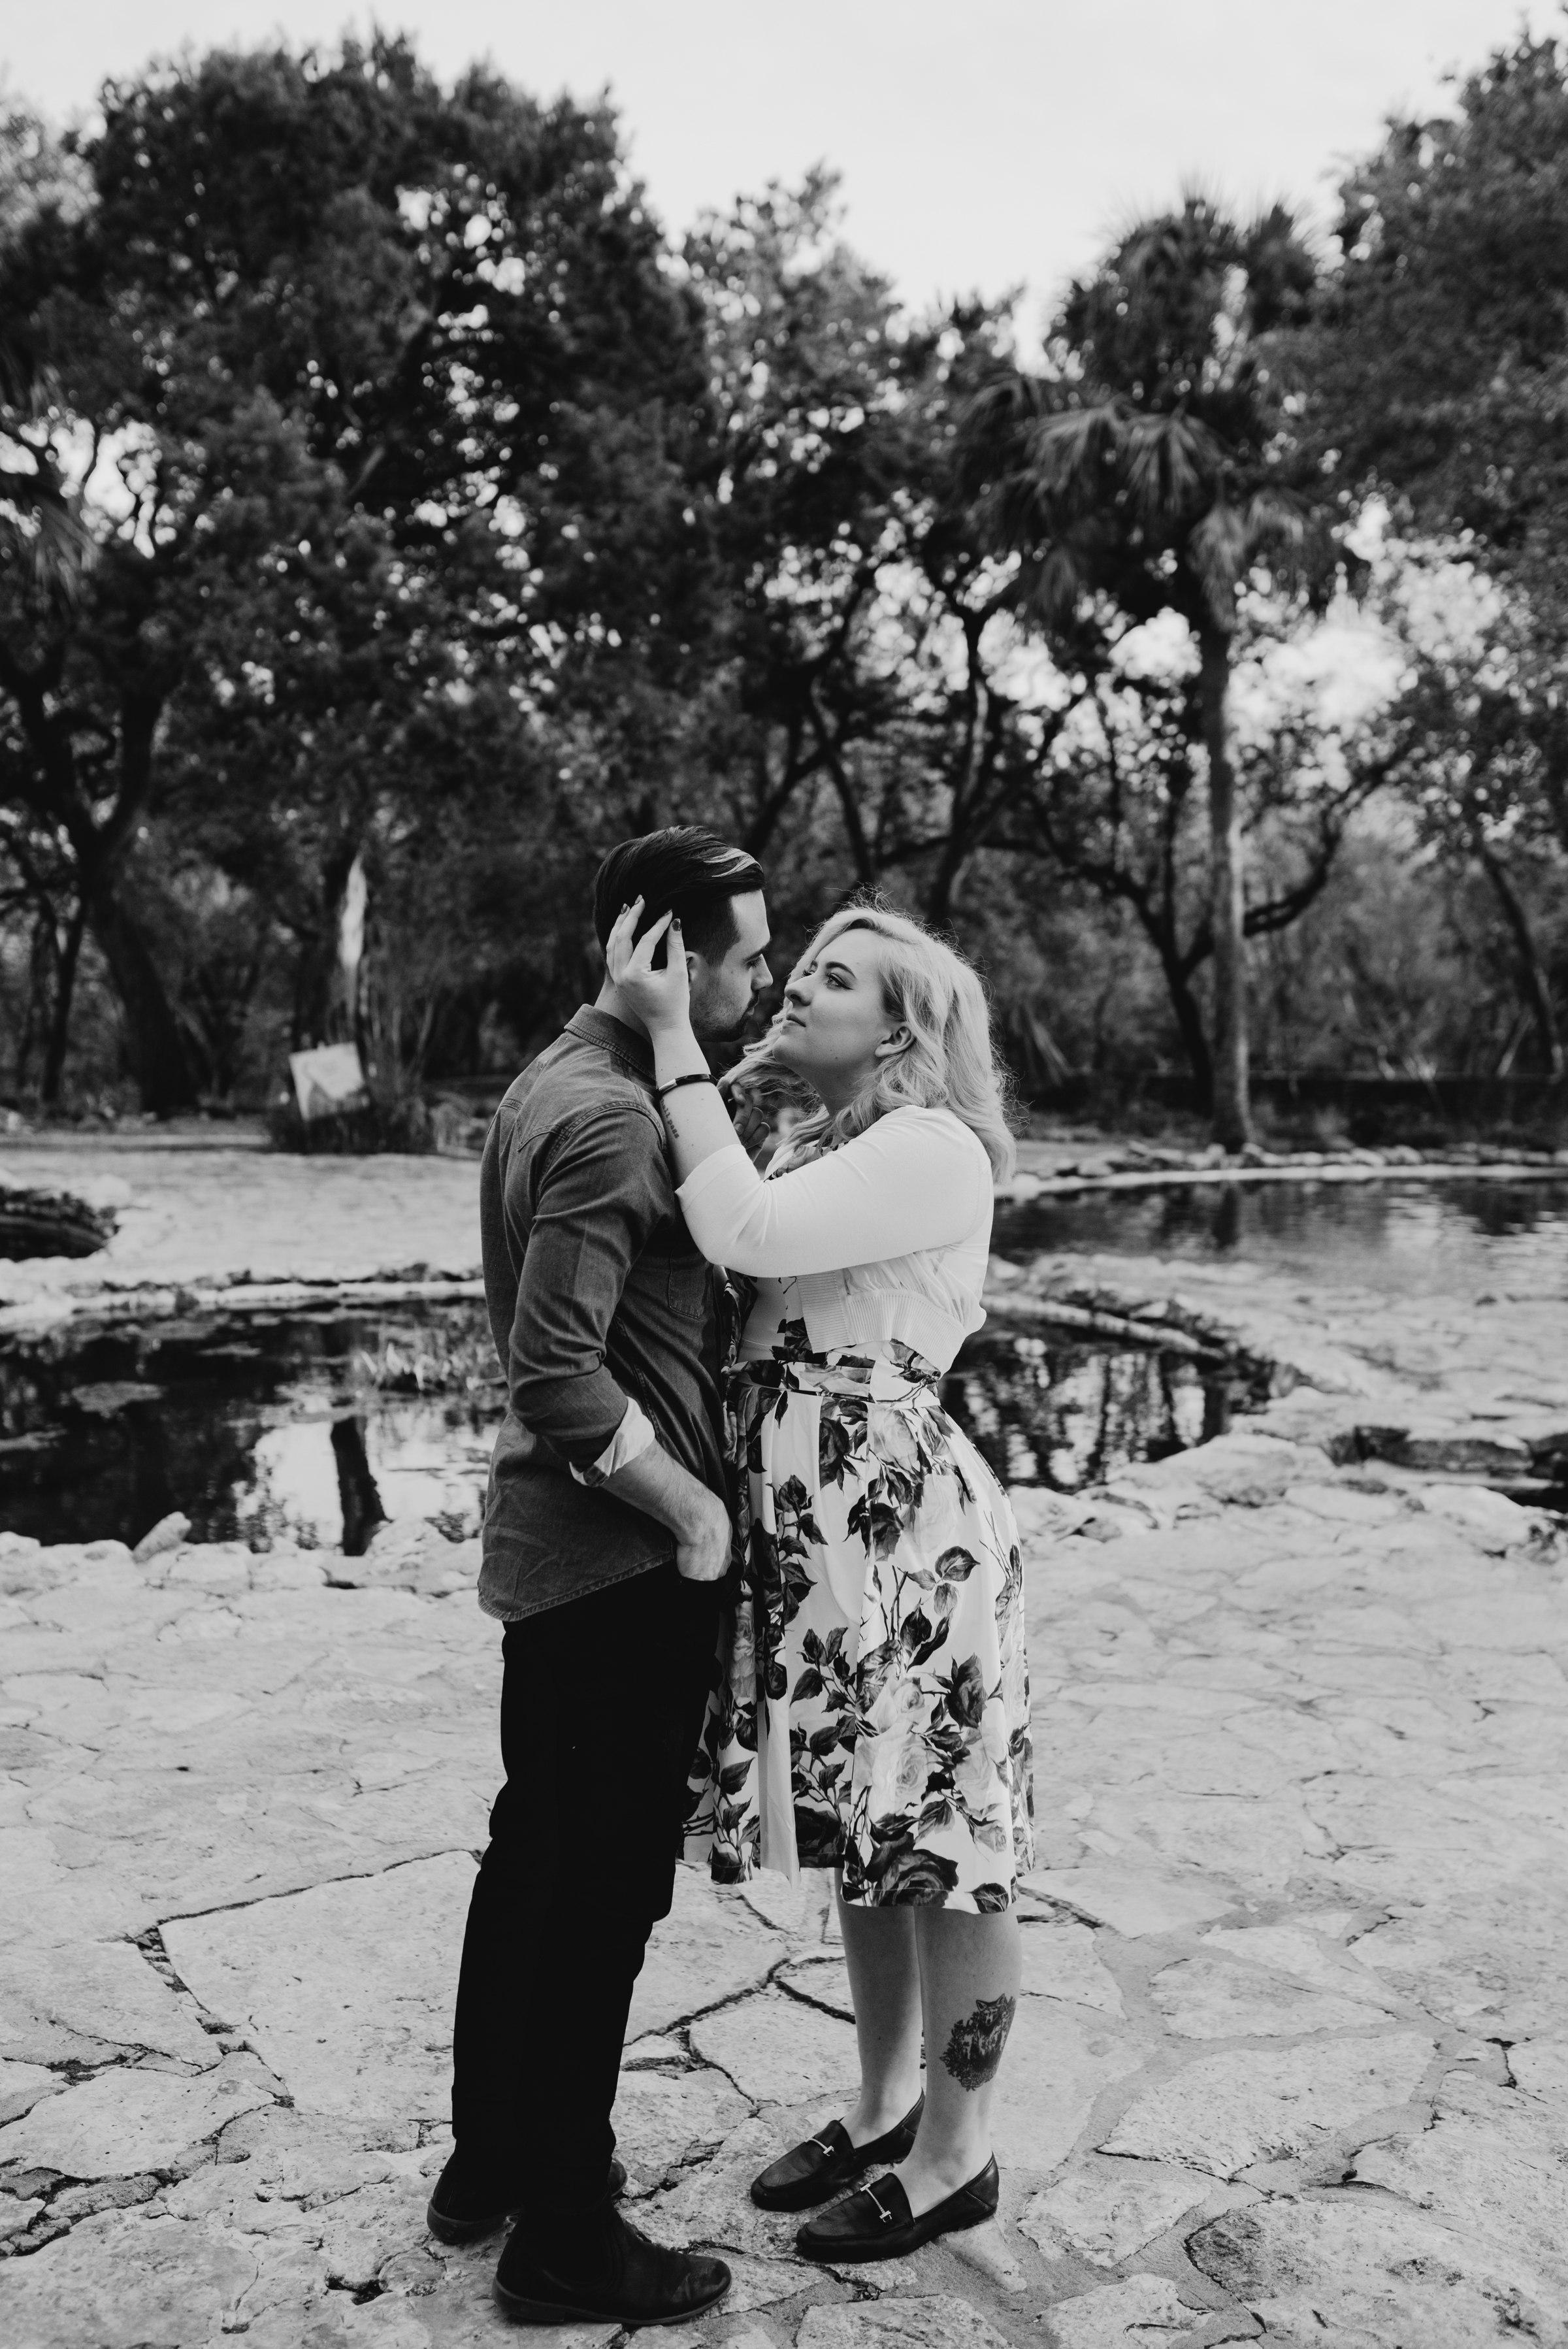 drew-andrew-texas-austin-minnesota-minneapolis-wedding-photographer-destination-elopement-intimate-adventurous_0082.jpg